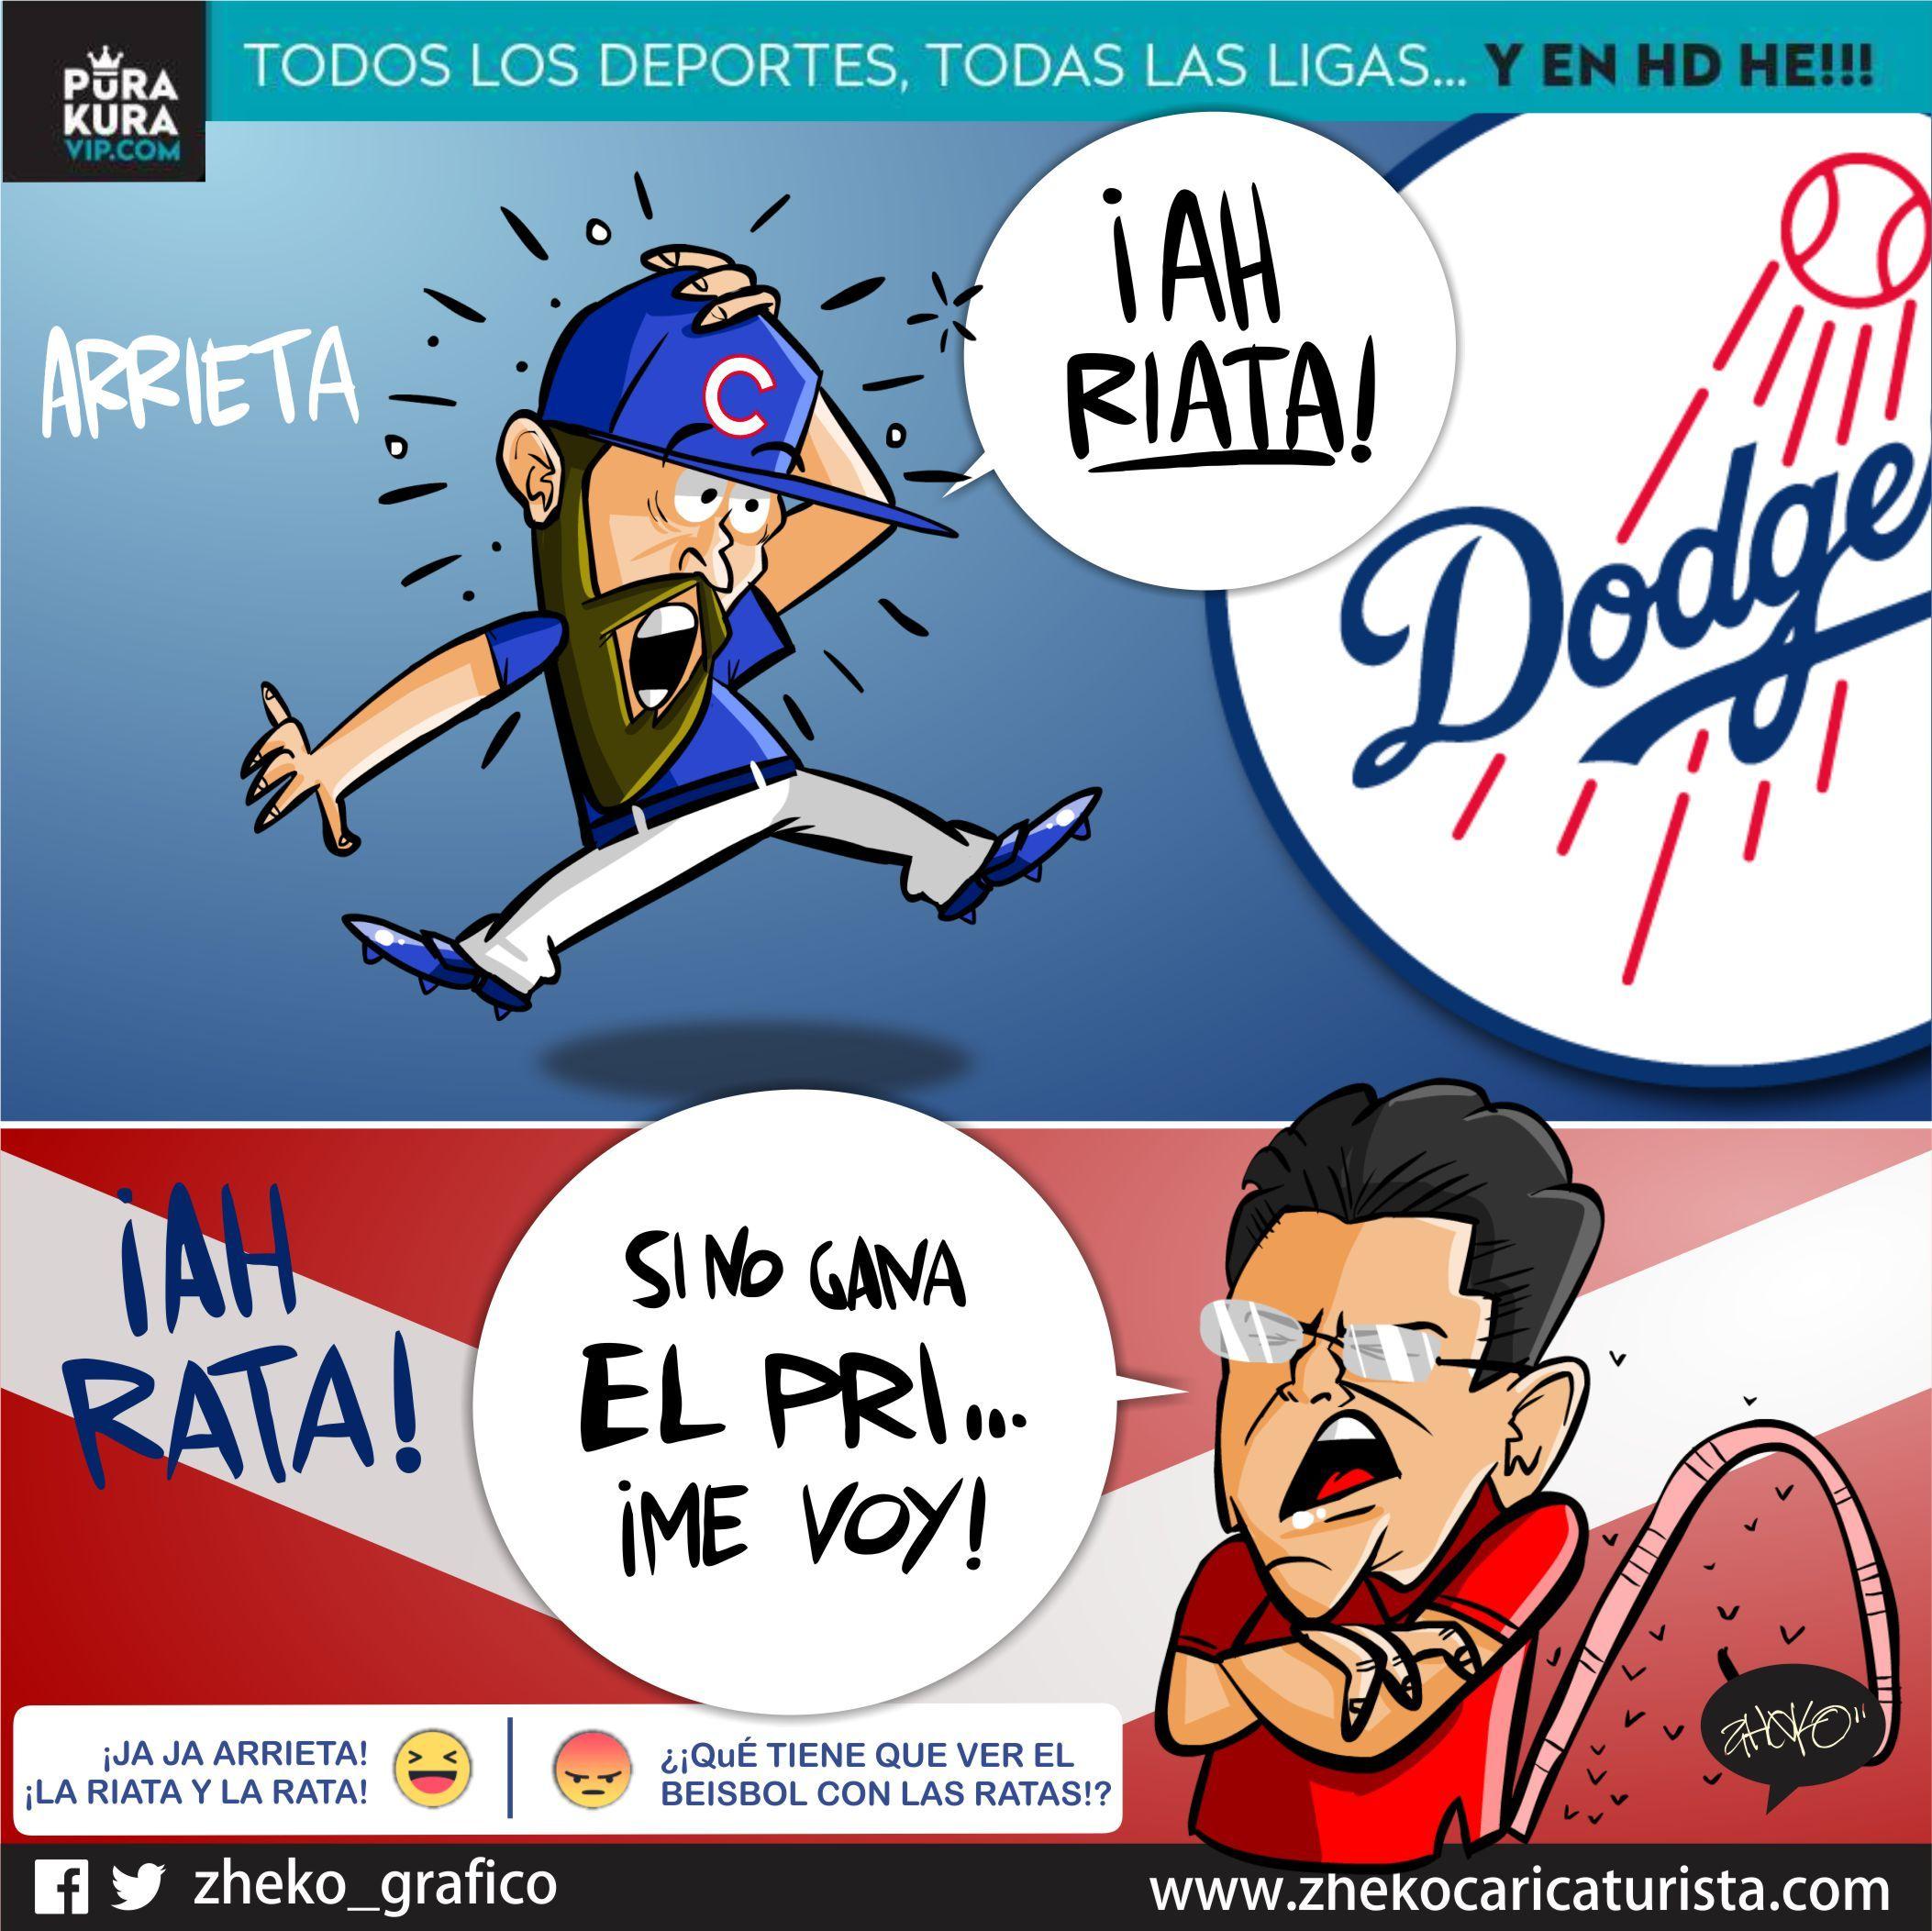 "#ElCartonDelDia para @PurakuraWeb ""ARRIETA, AH RIATA Y AH RATA"" @JArrieta34 @LosDodgers @Cubs@fidelkugra #Veracruz"